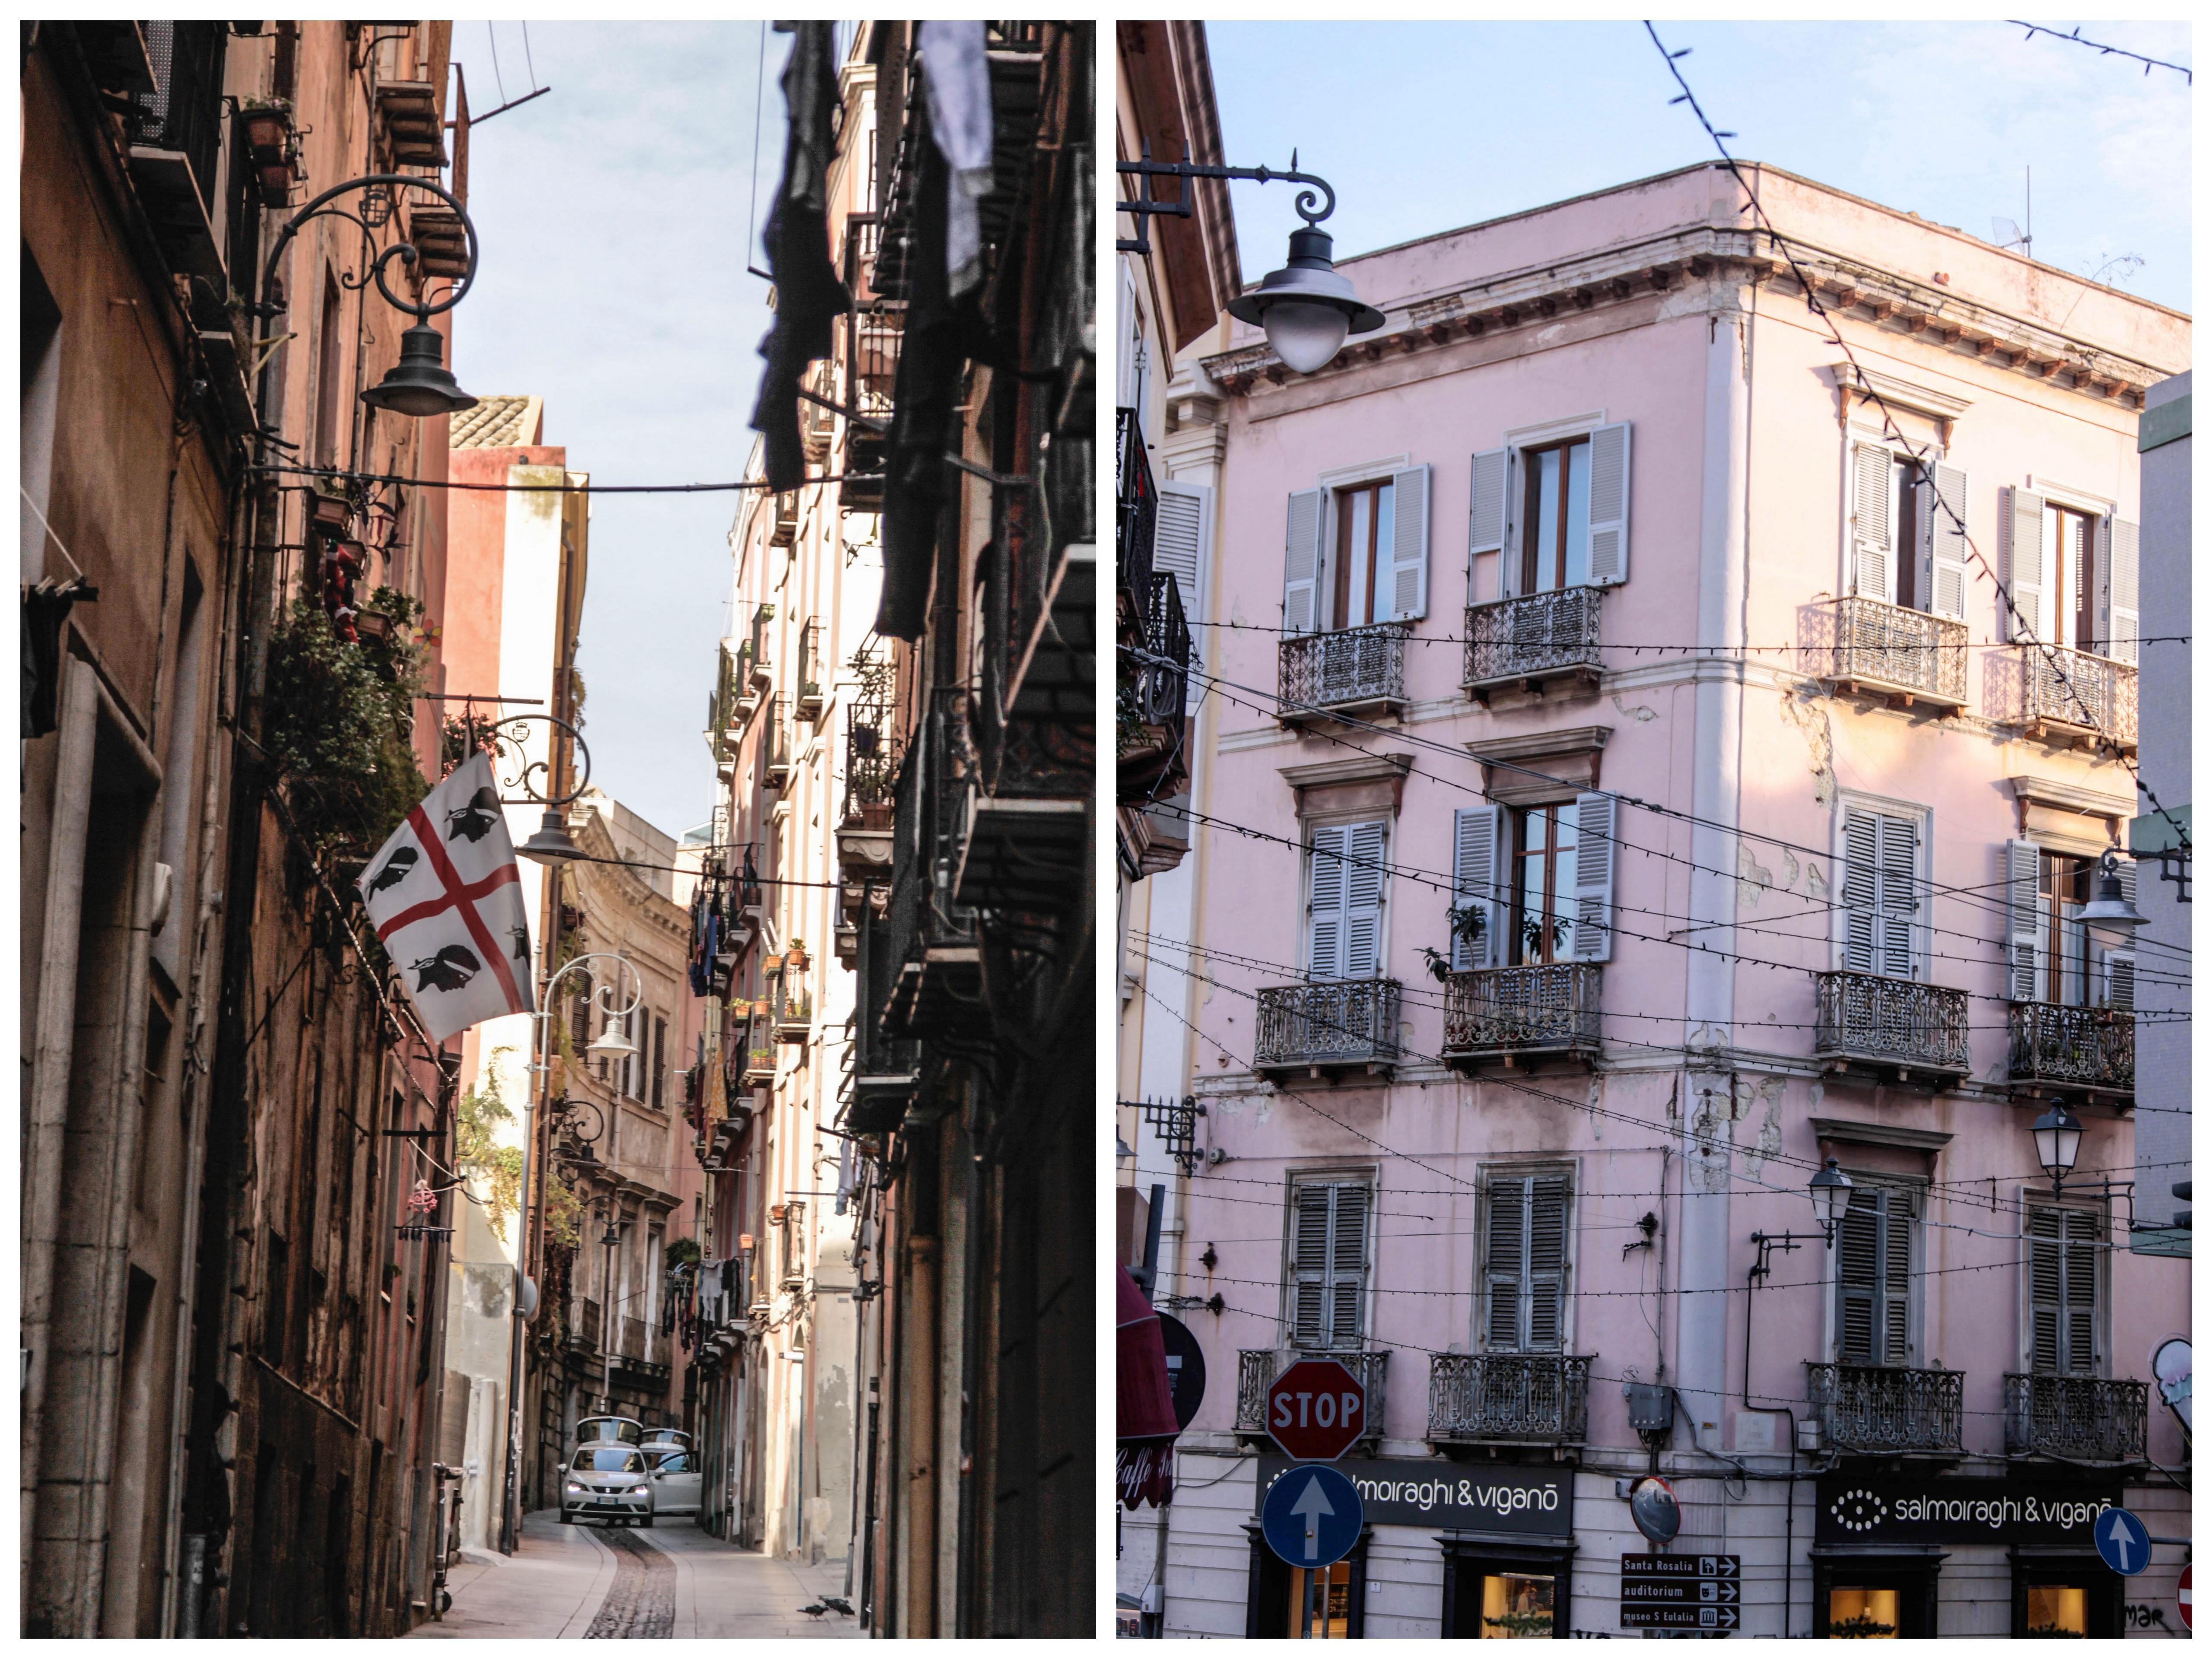 Cagliari_street_Smell_of_Jasmine